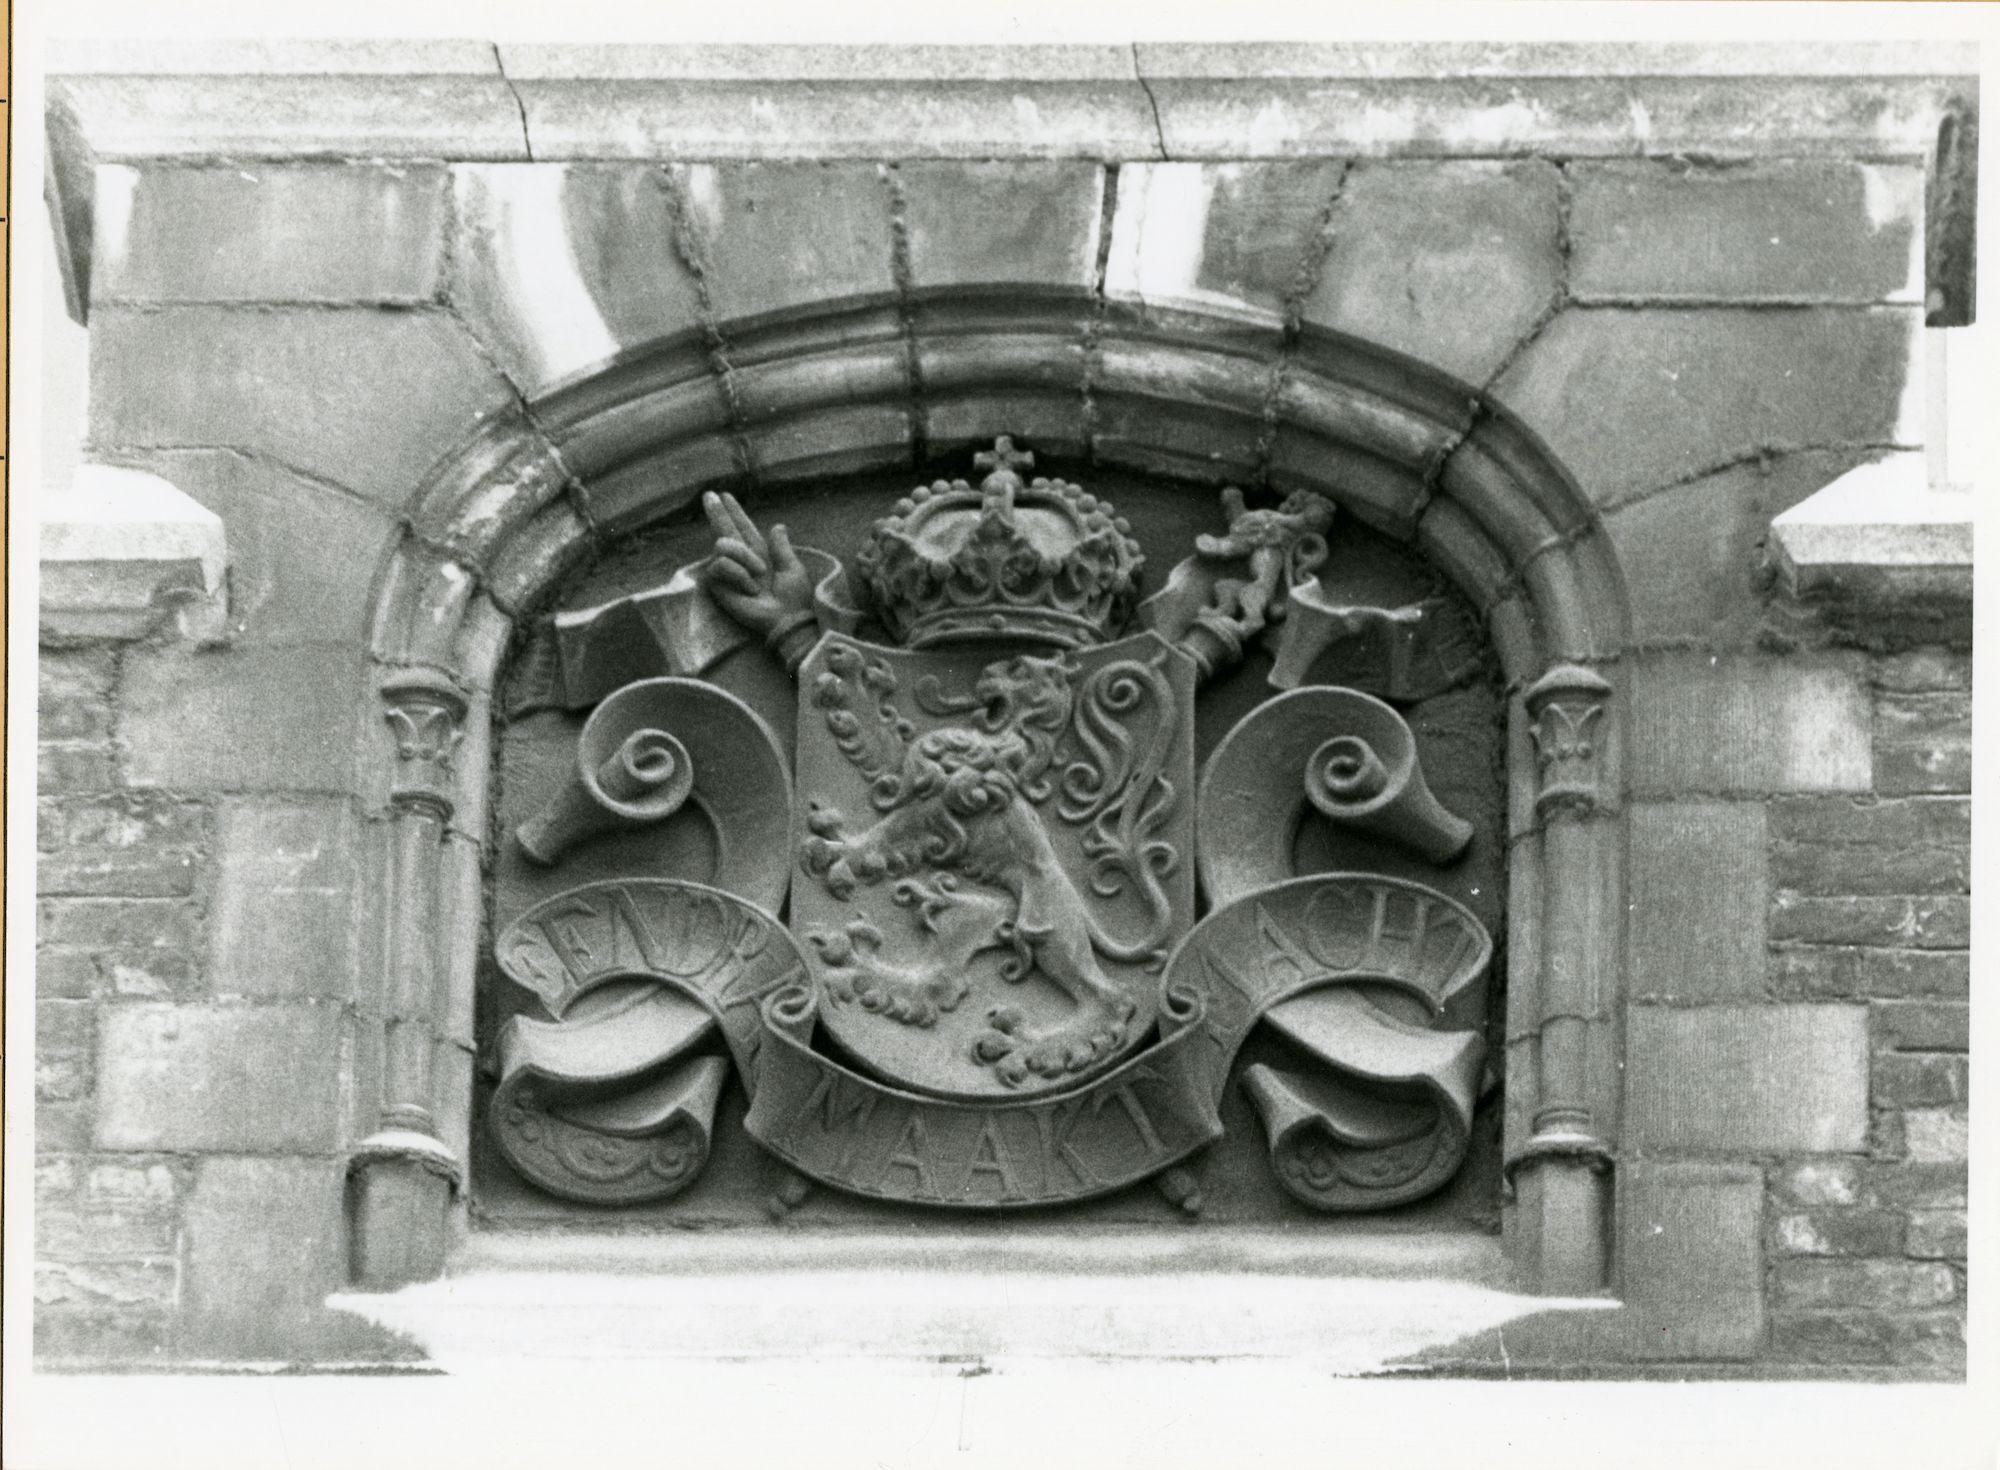 Gent: Gaspar De Craeyerstraat 2: Leopoldskazerne: reliëf: wapenschild België, 1979